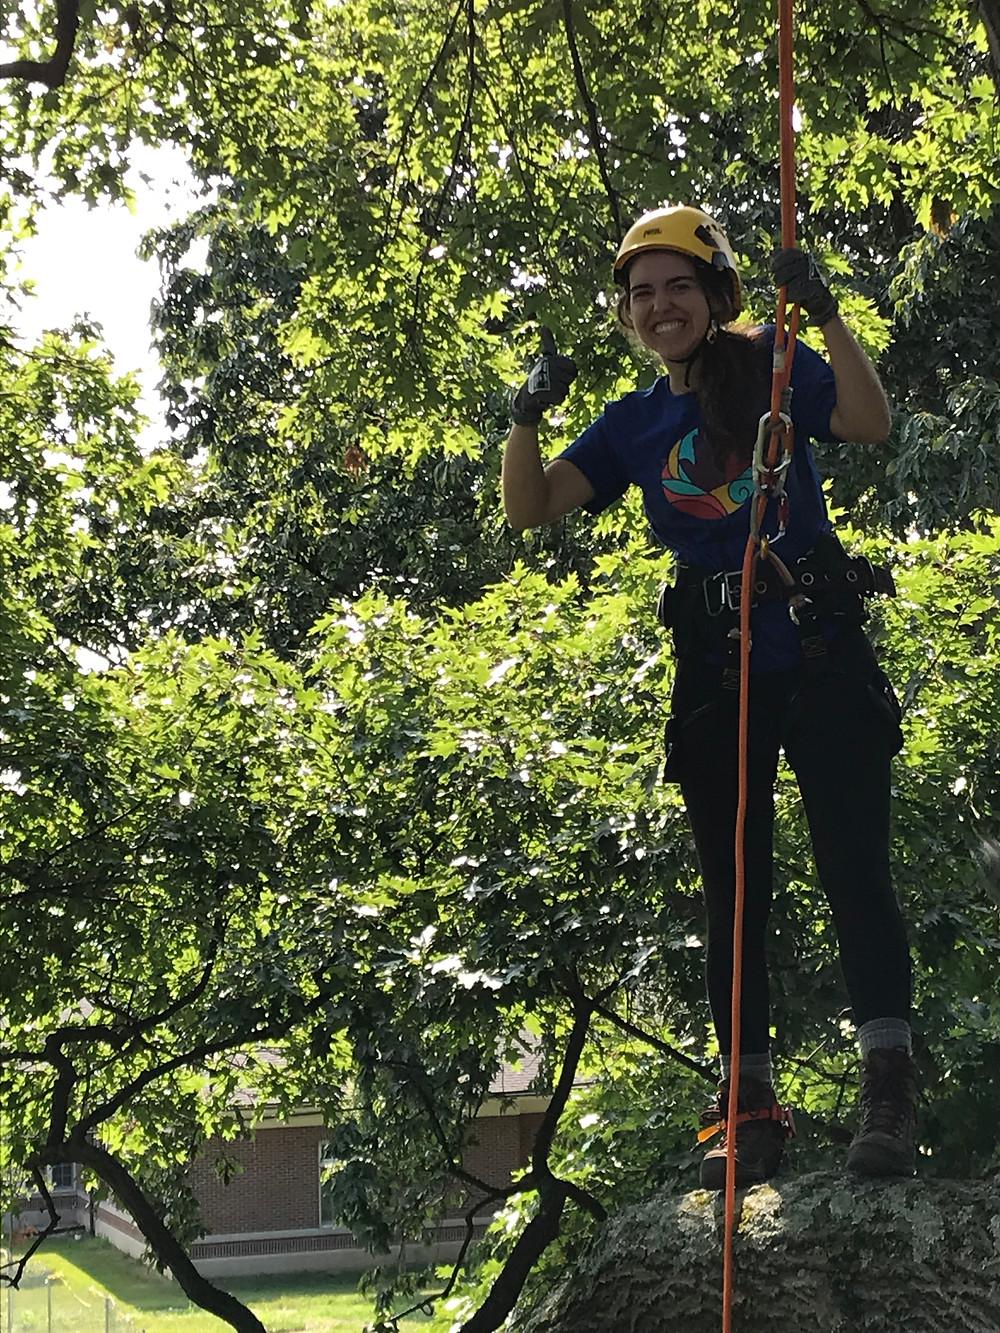 Jenny standing on tree limb in climbing gear